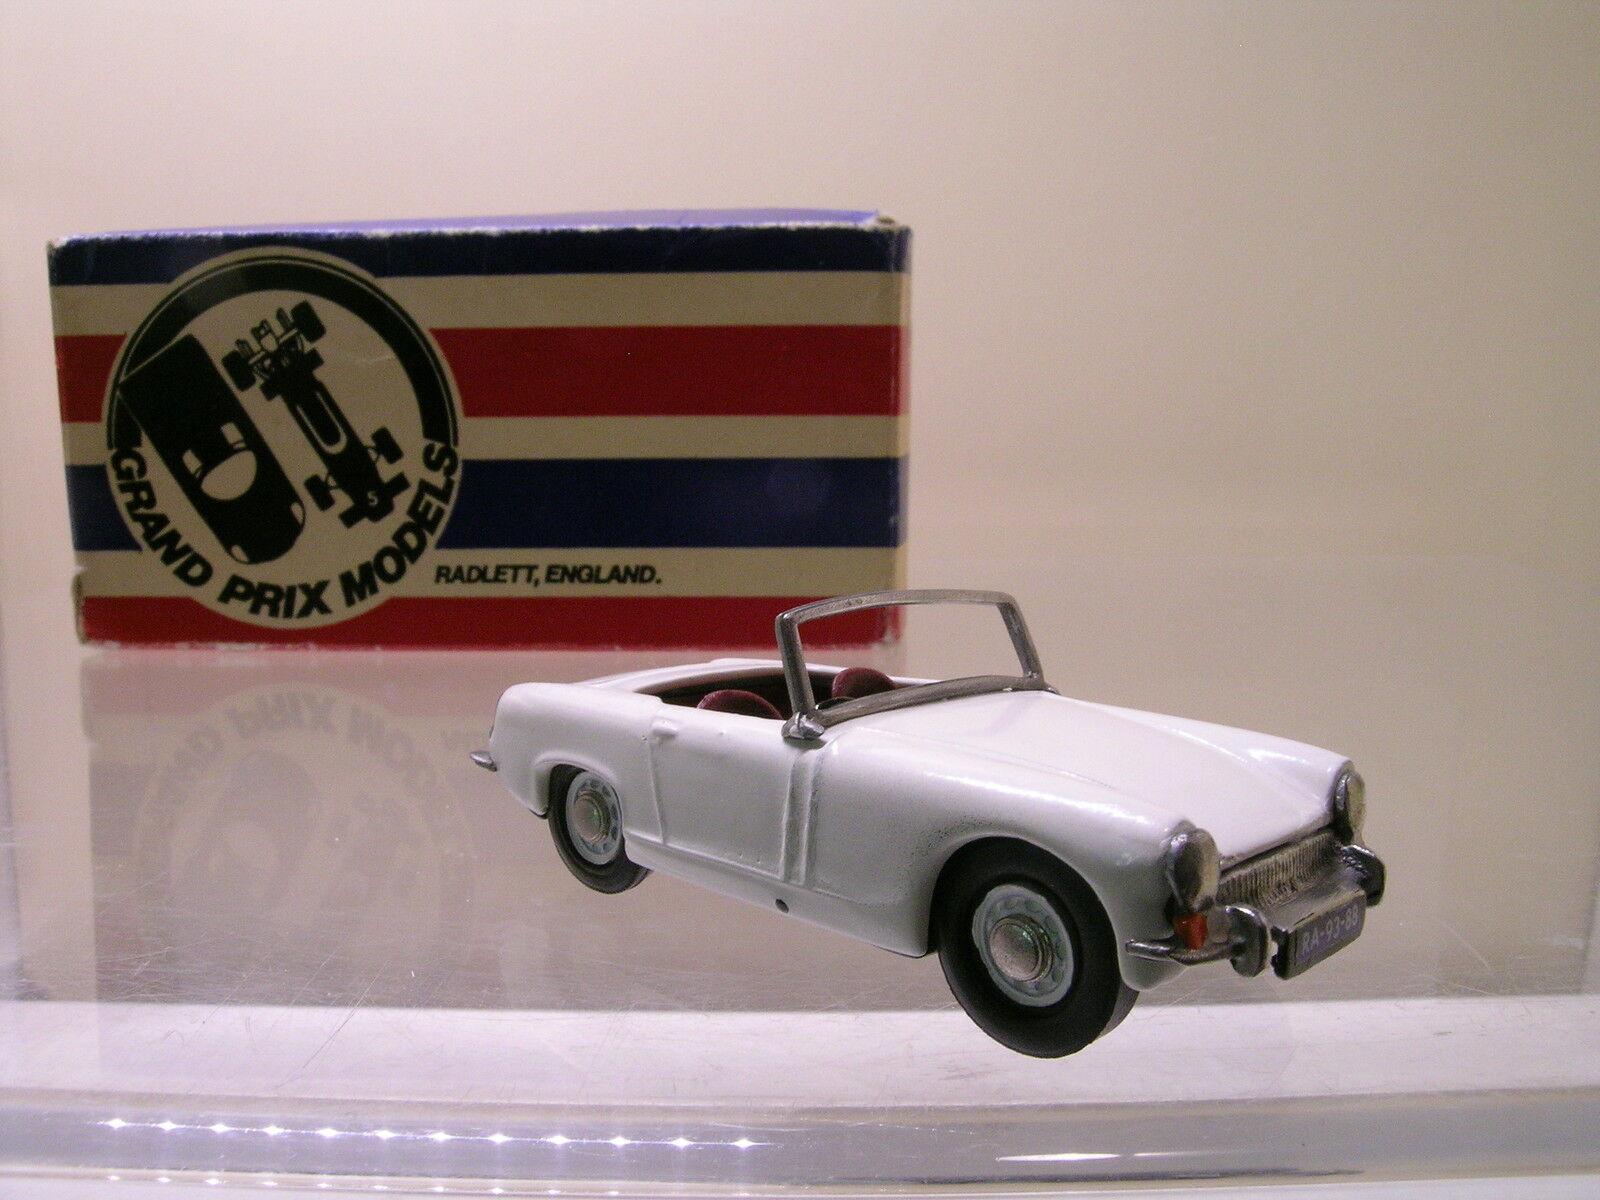 GRAND PRIX MODELS 712 MG MIDGET ROADSTER 1965 WHITE METAL HANDBUILT BOXED 1 43